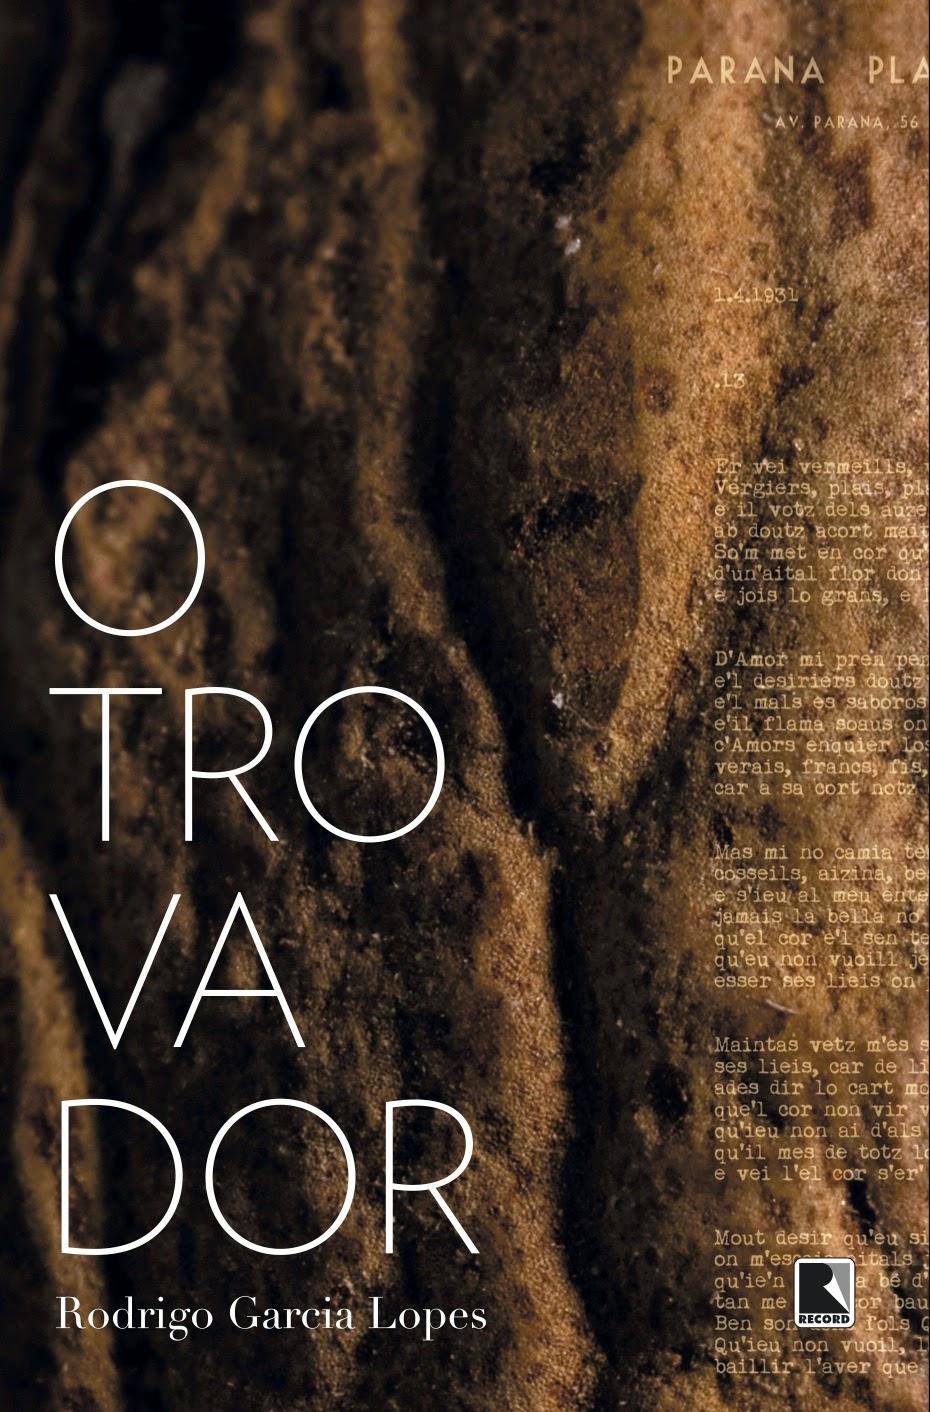 O TROVADOR